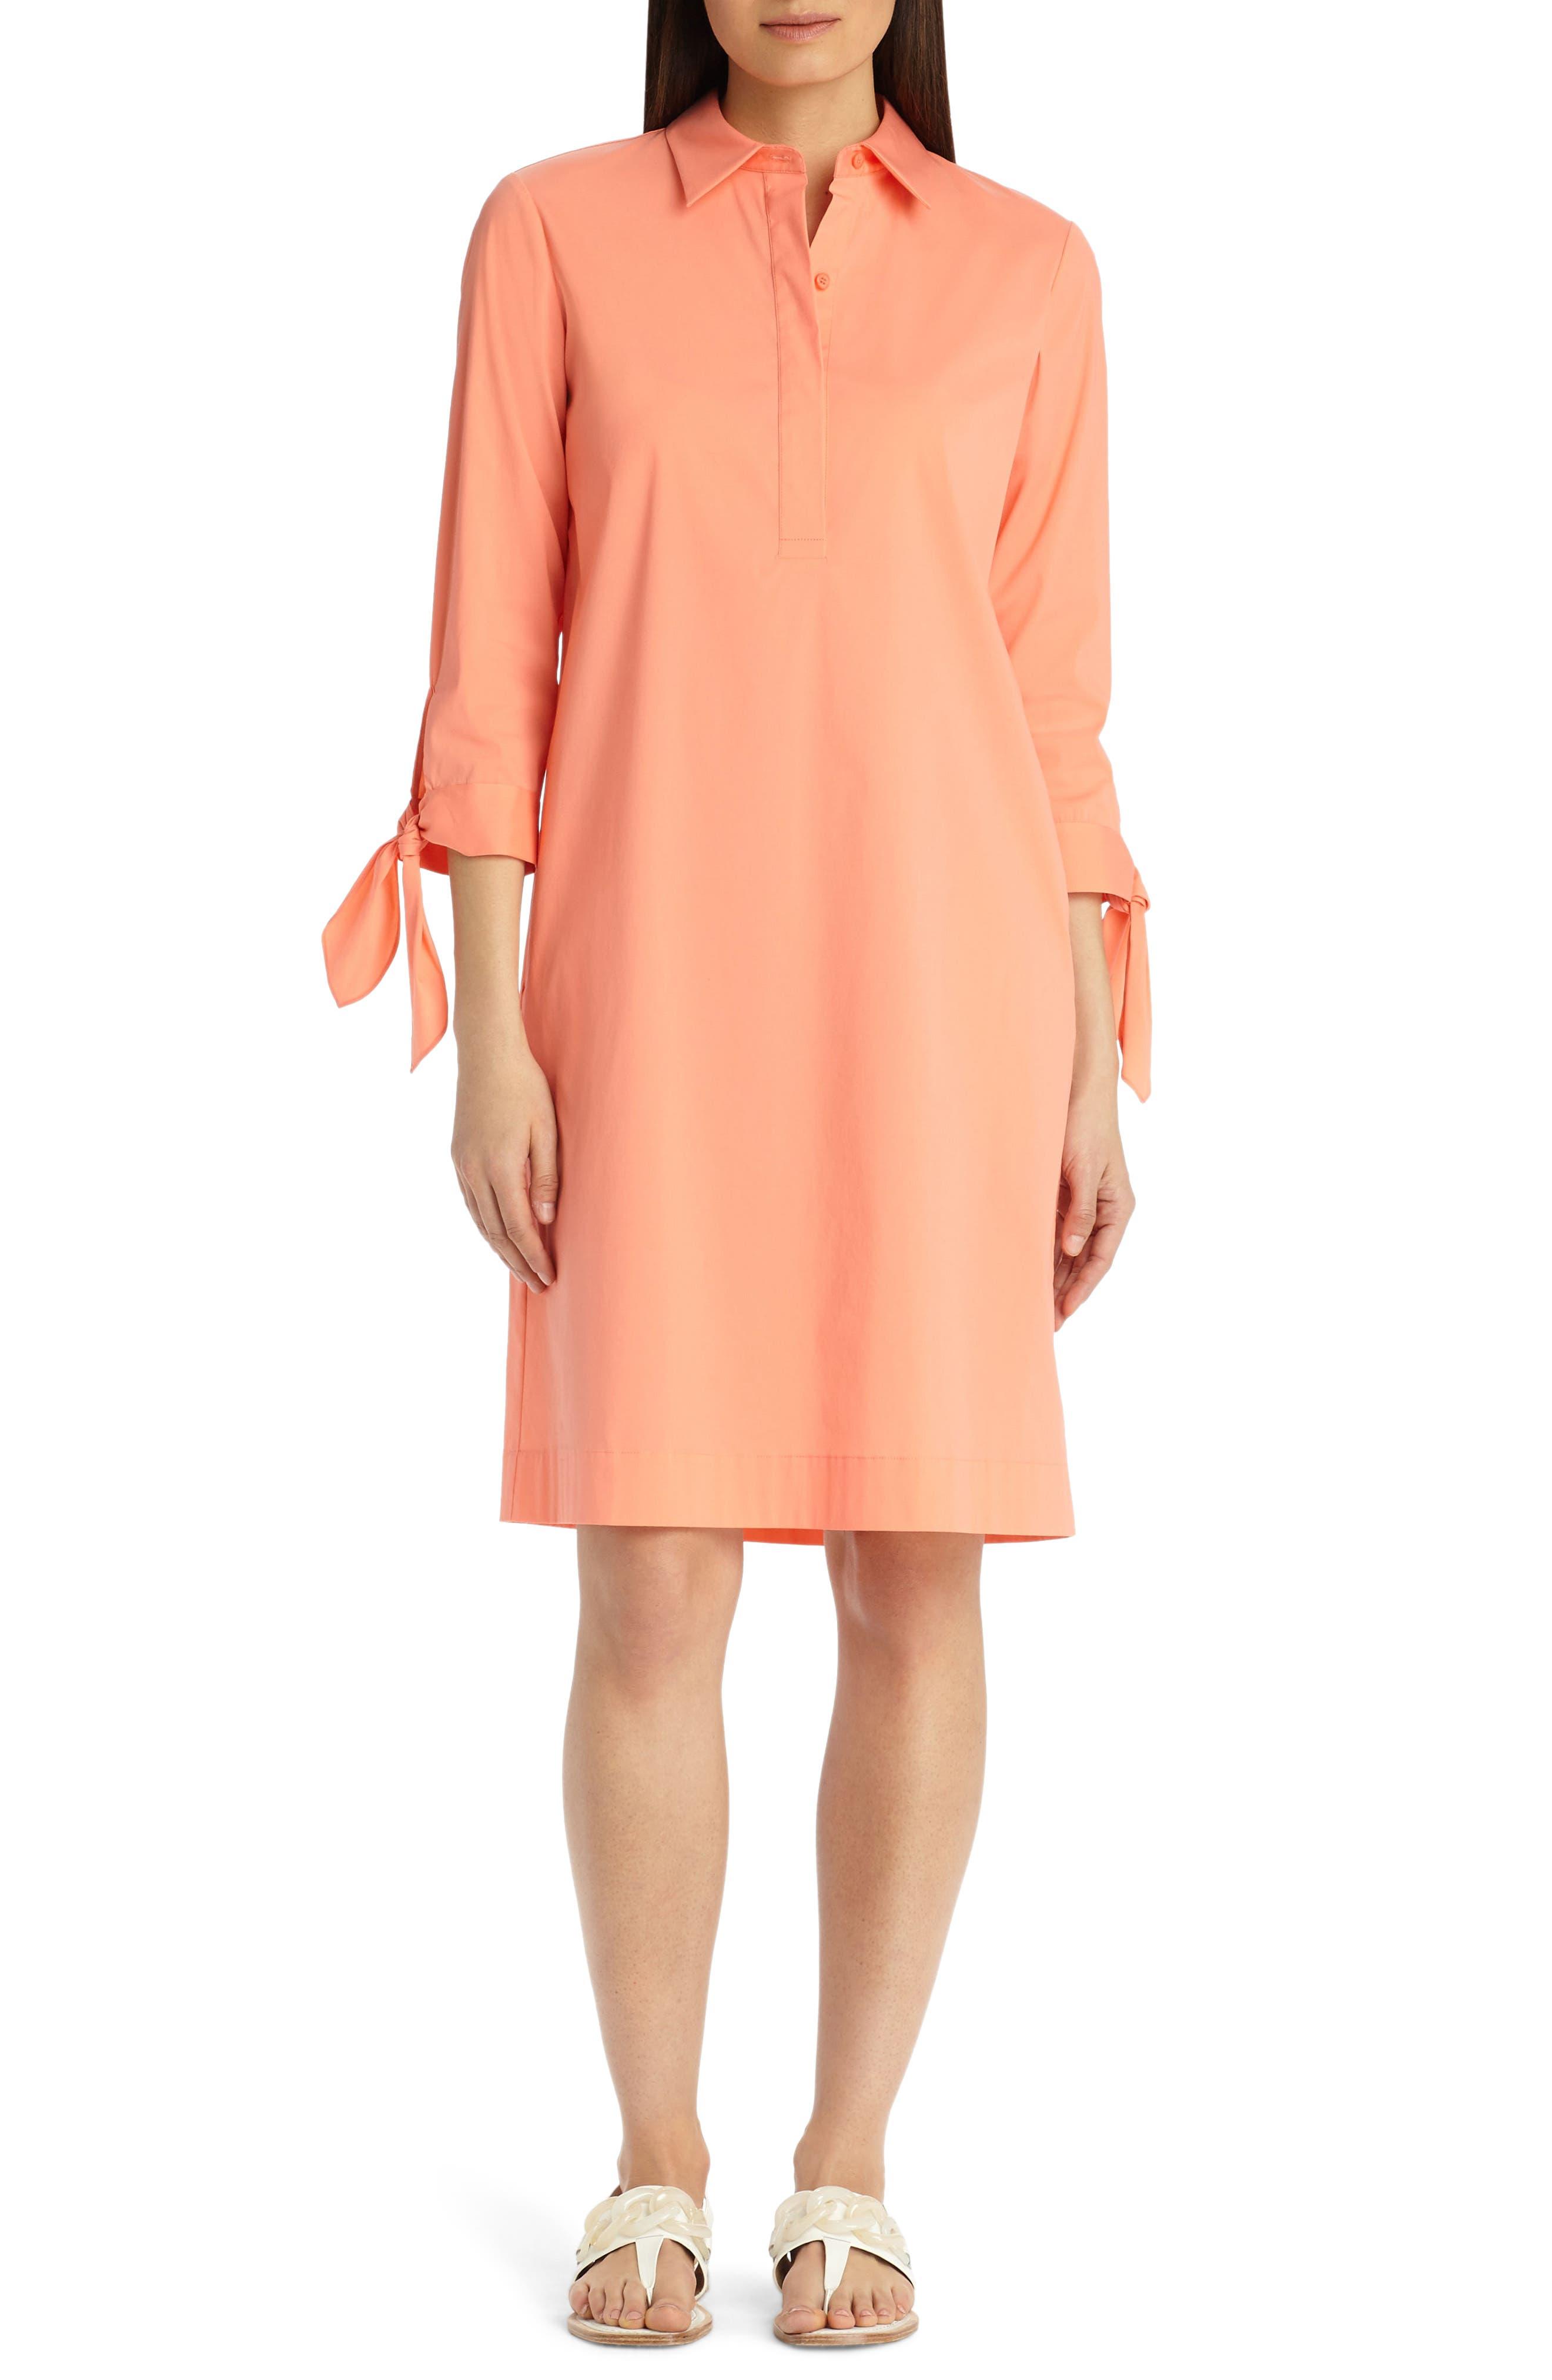 Main Image - Lafayette 148 New York Talia Stretch Cotton Blend Dress